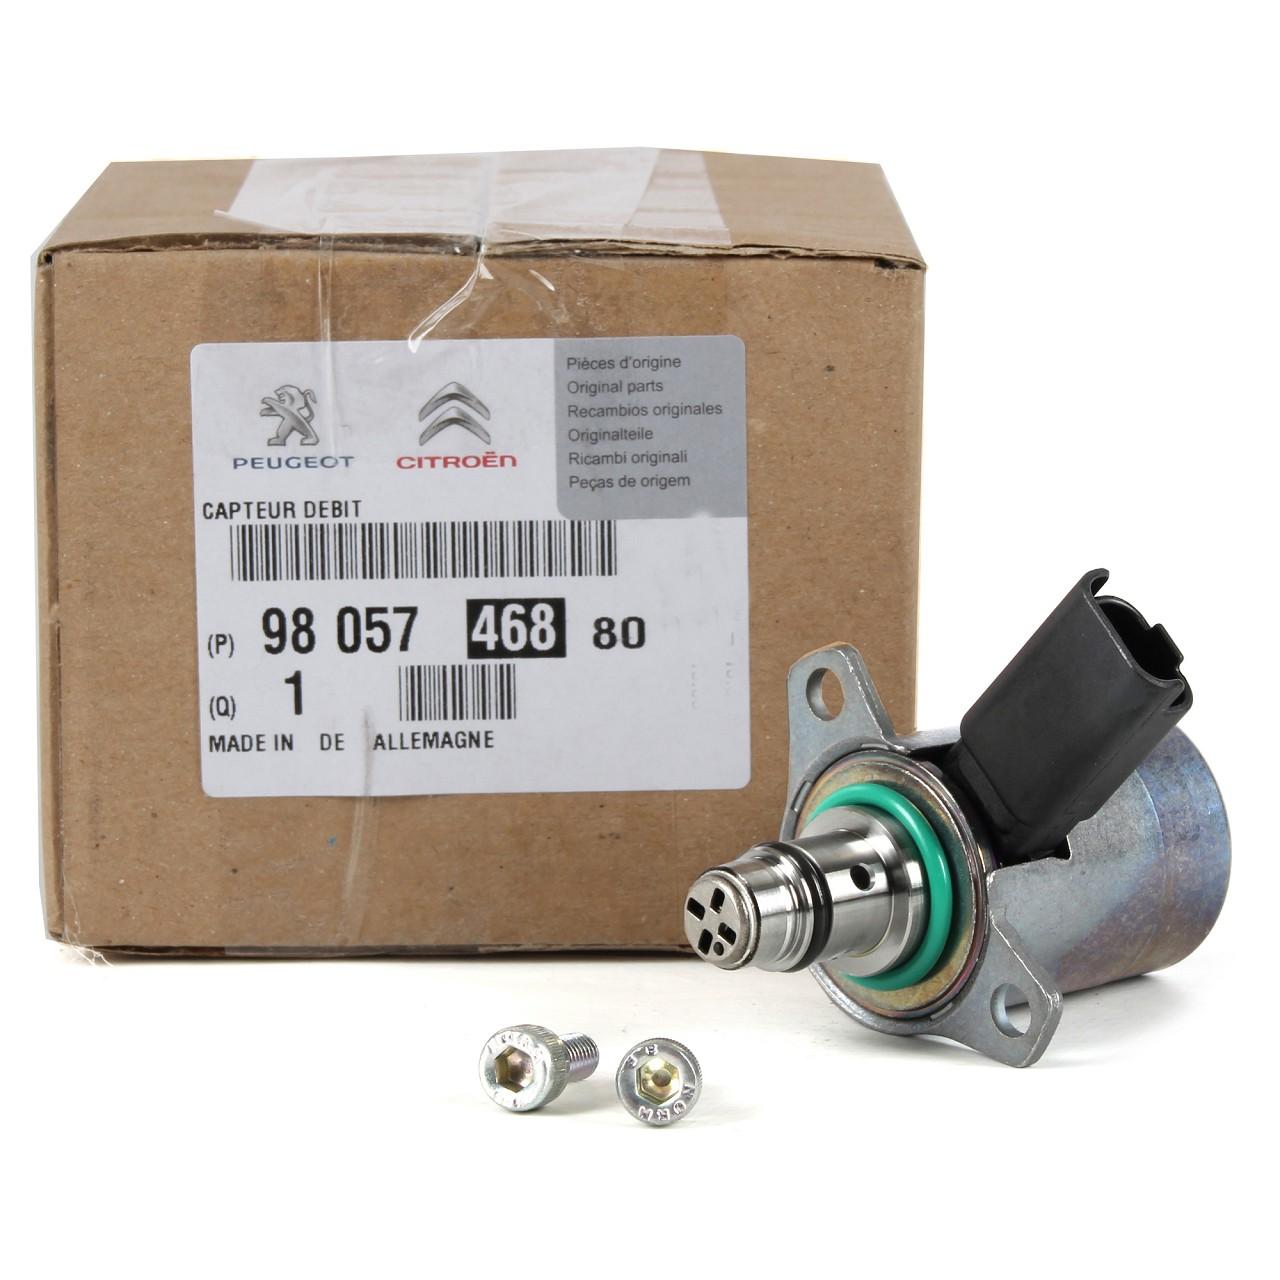 ORIGINAL Citroen Peugeot Kraftstoffdruckregler Druckregler 9805746880 für 2.2HDi